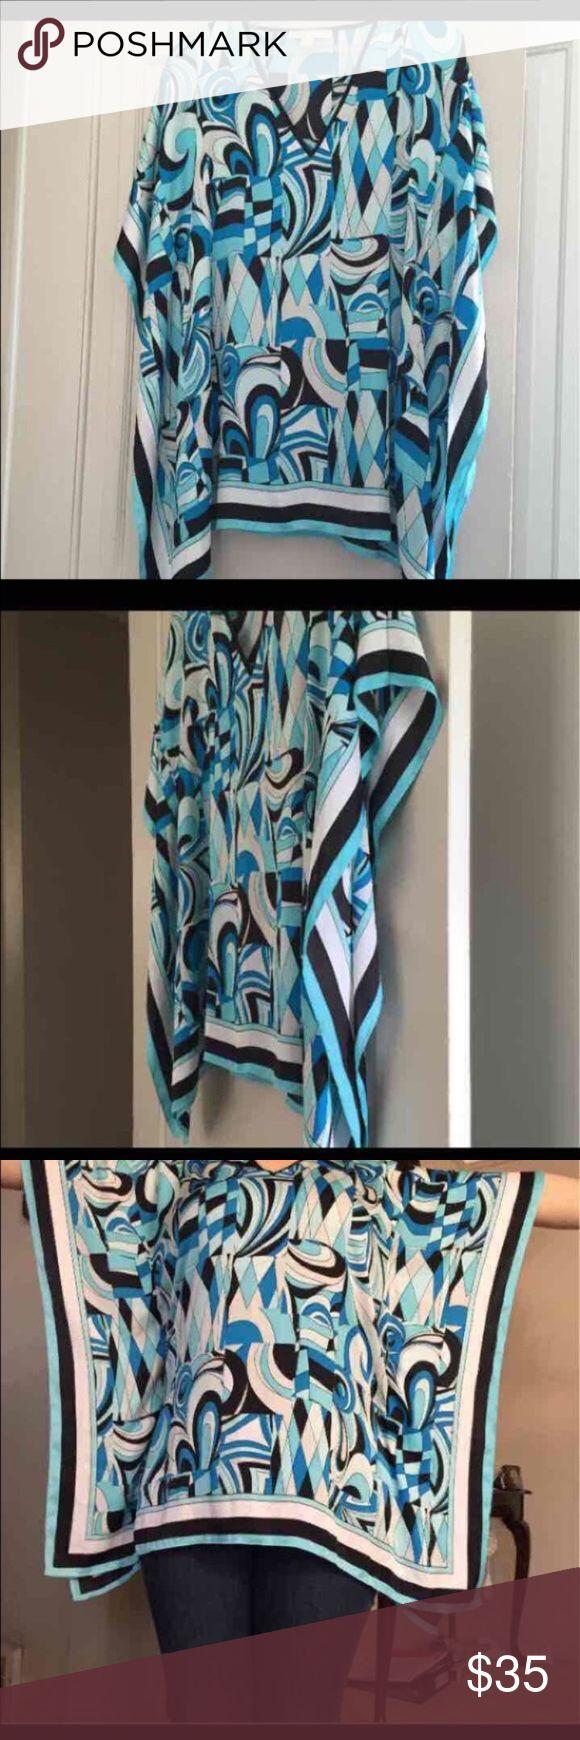 Michael Kors Kimono Top Michael Kors blue, white and black kimono/batwing top size S/M.  New without tag Michael Kors Tops Tunics